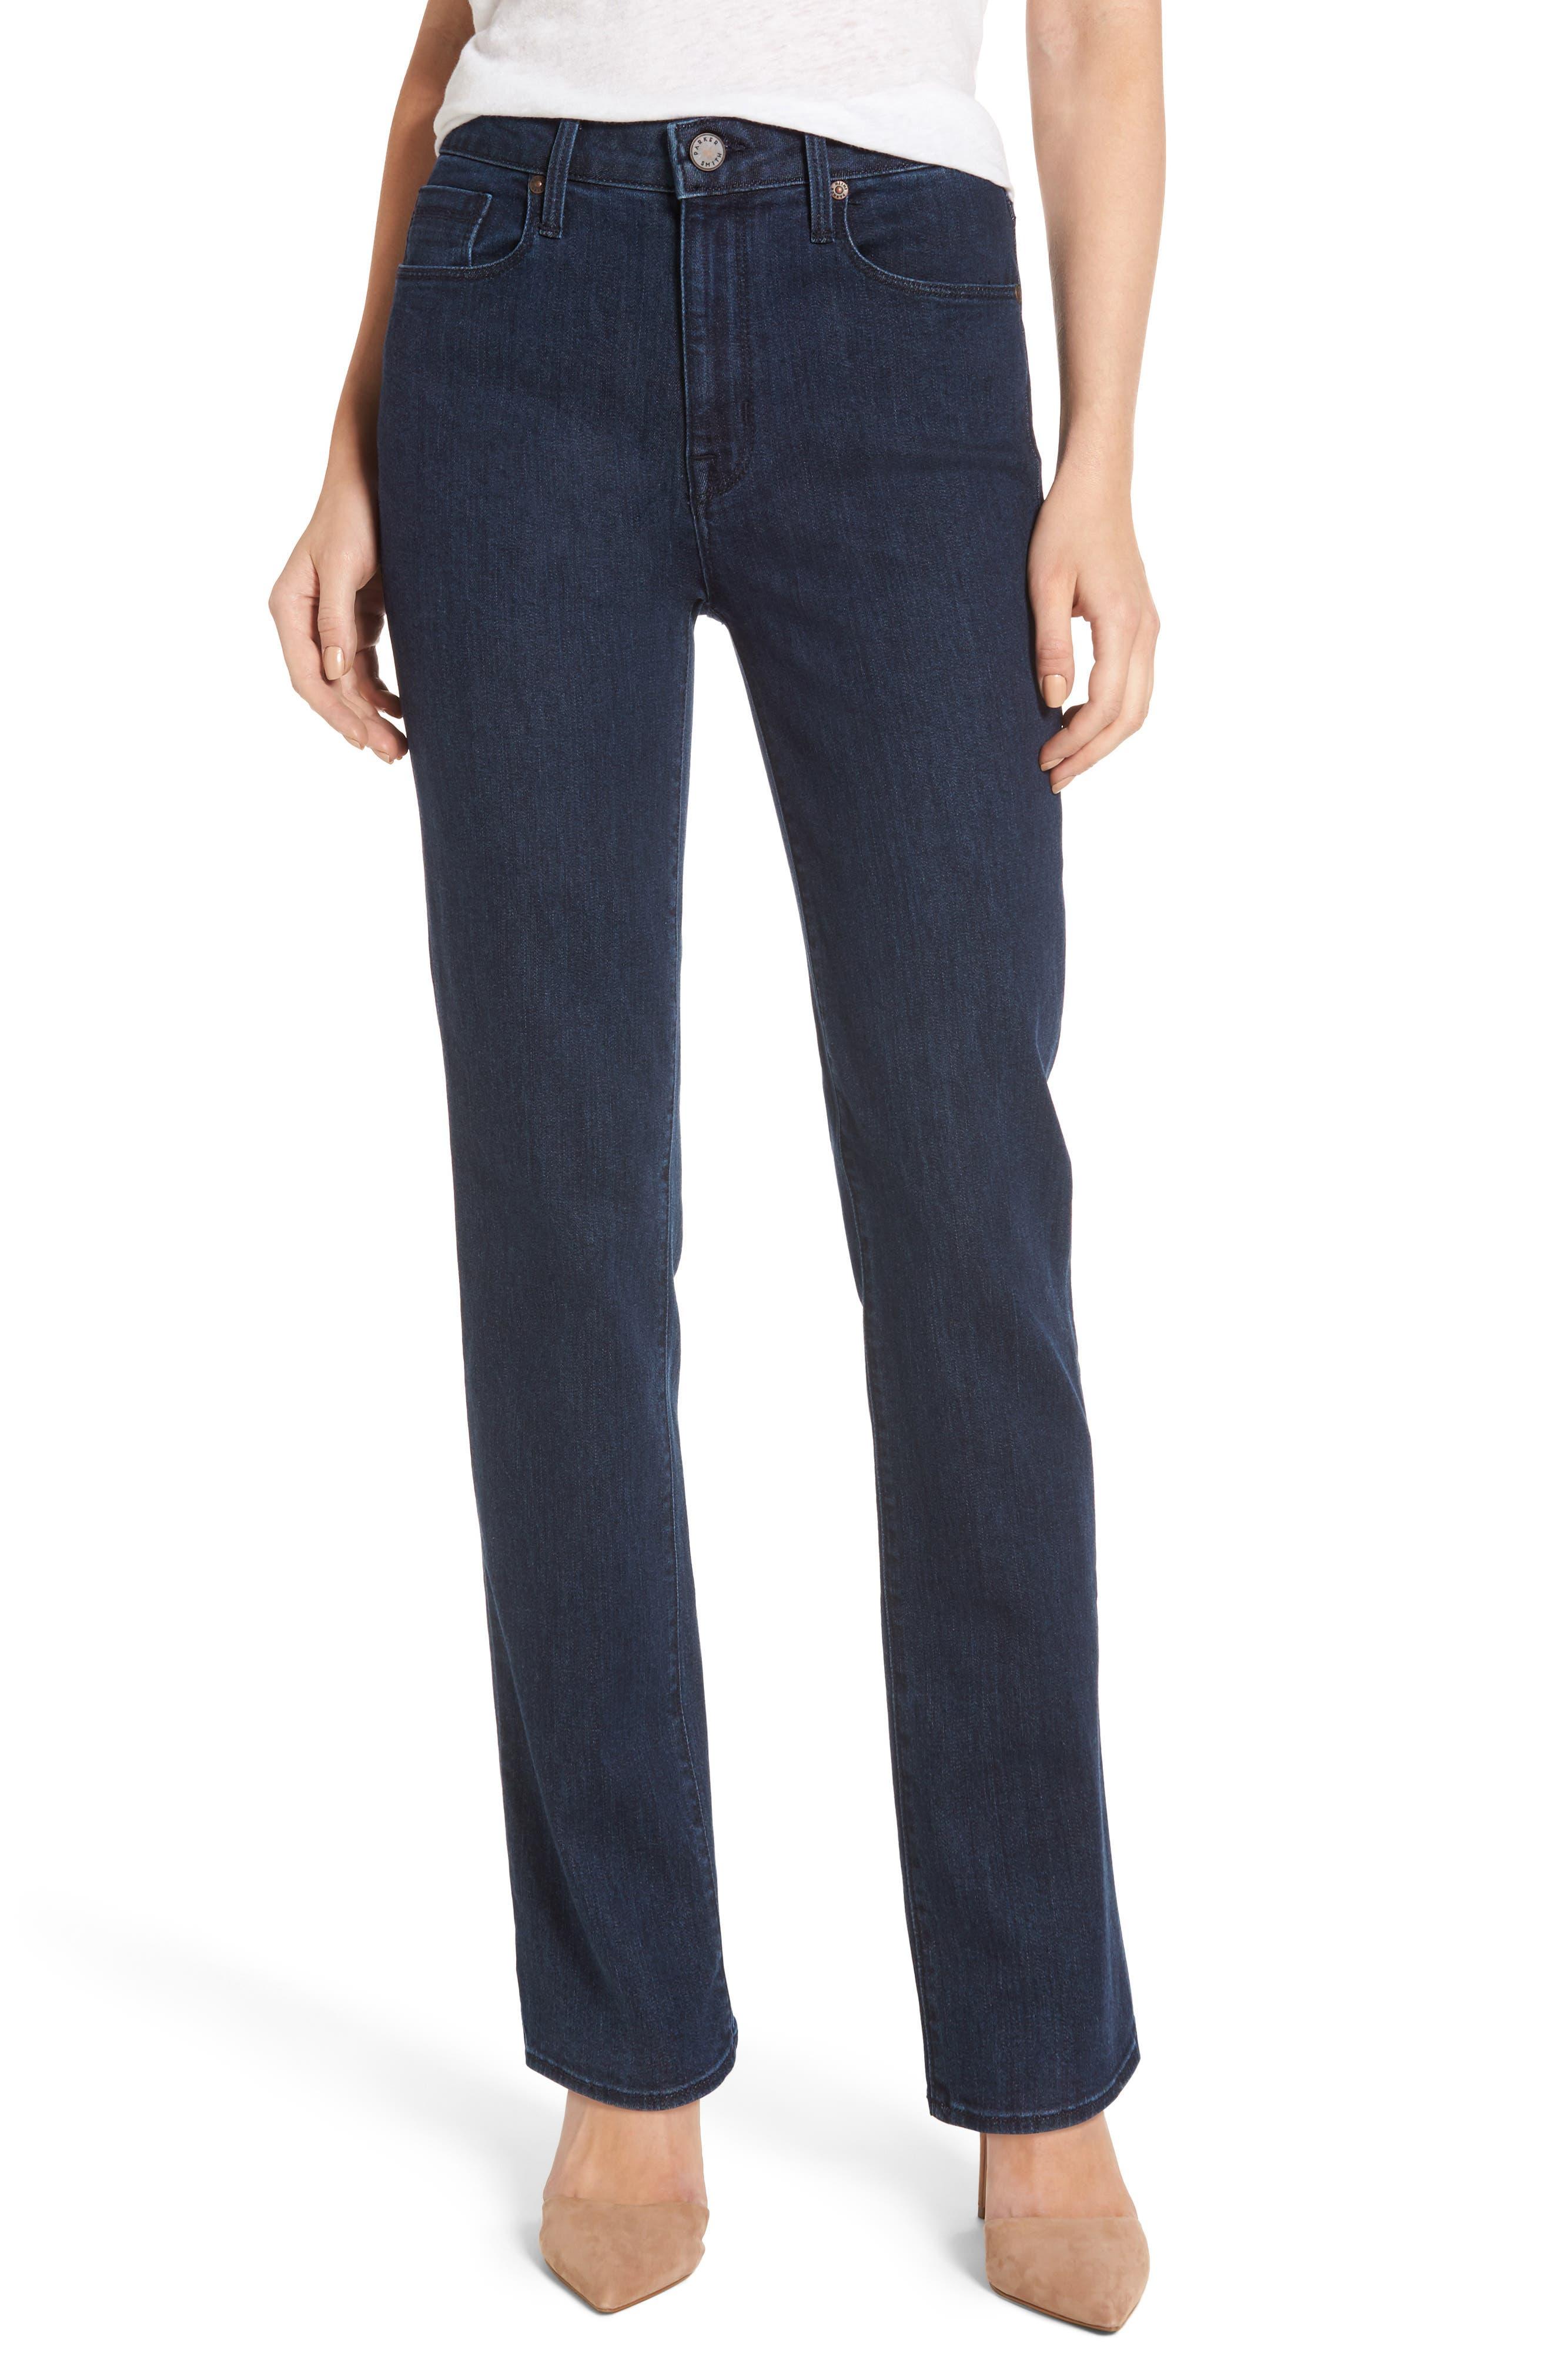 Bombshell Runaround Straight Leg Jeans,                         Main,                         color, Baltic